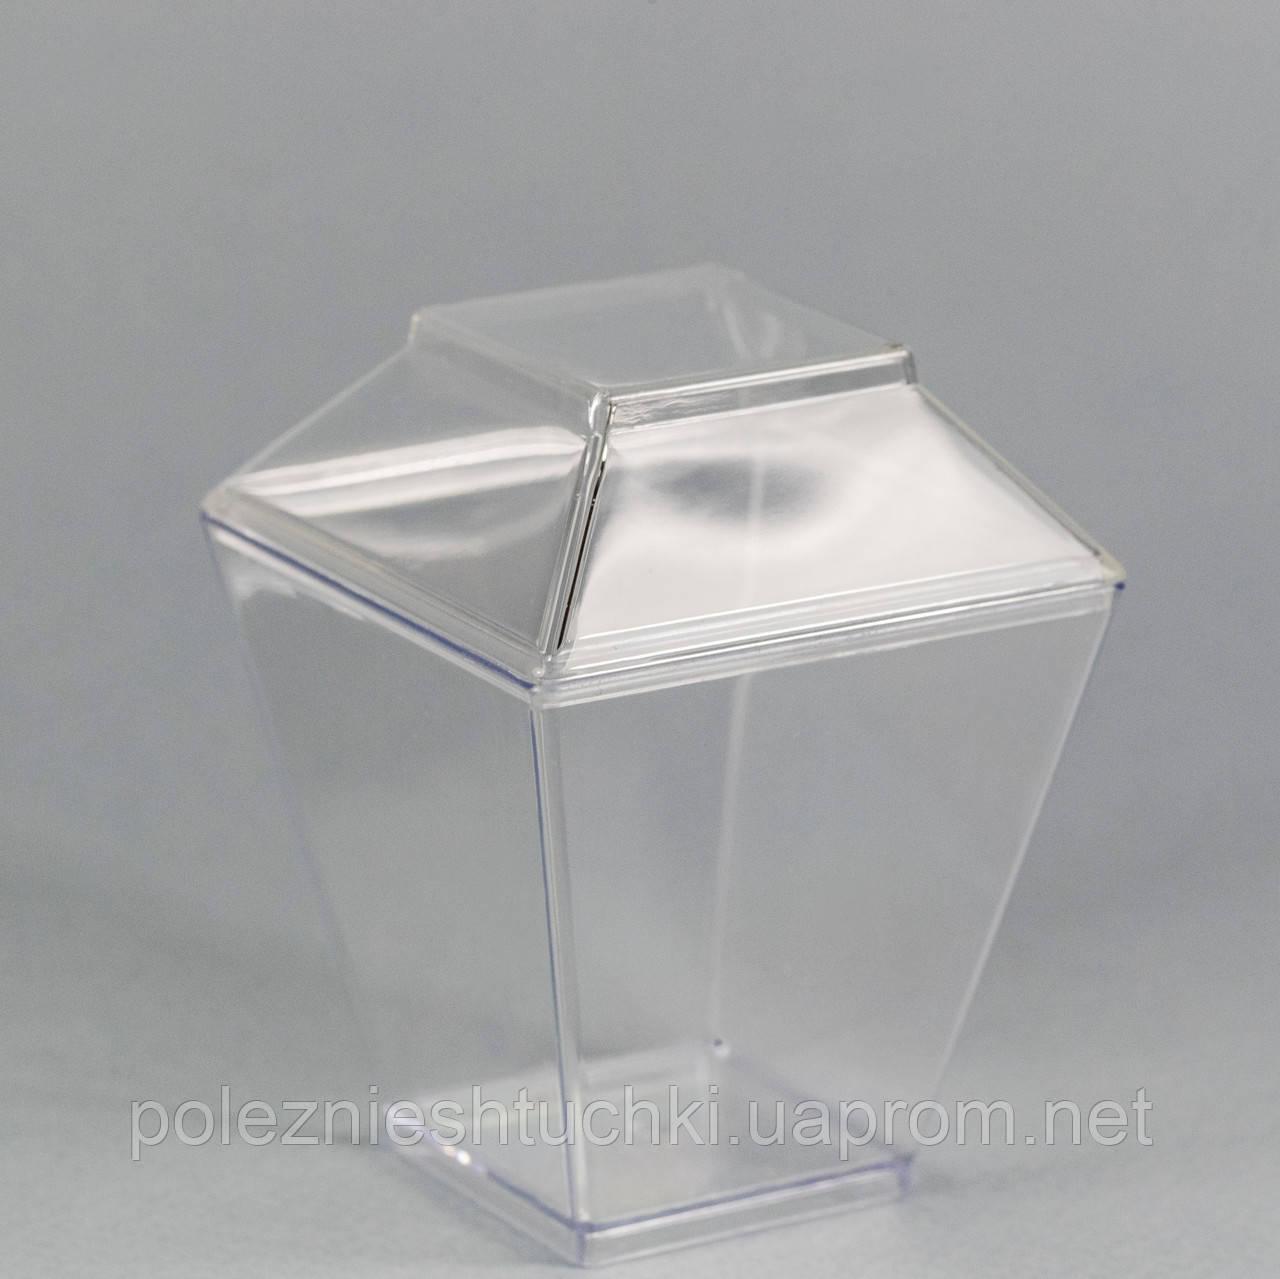 "Пиала с крышкой фуршетная круглая 120 мл., 6,2х6,2х8 см., 50 шт/уп стеклоподобный, прозрачная ""Пирам"